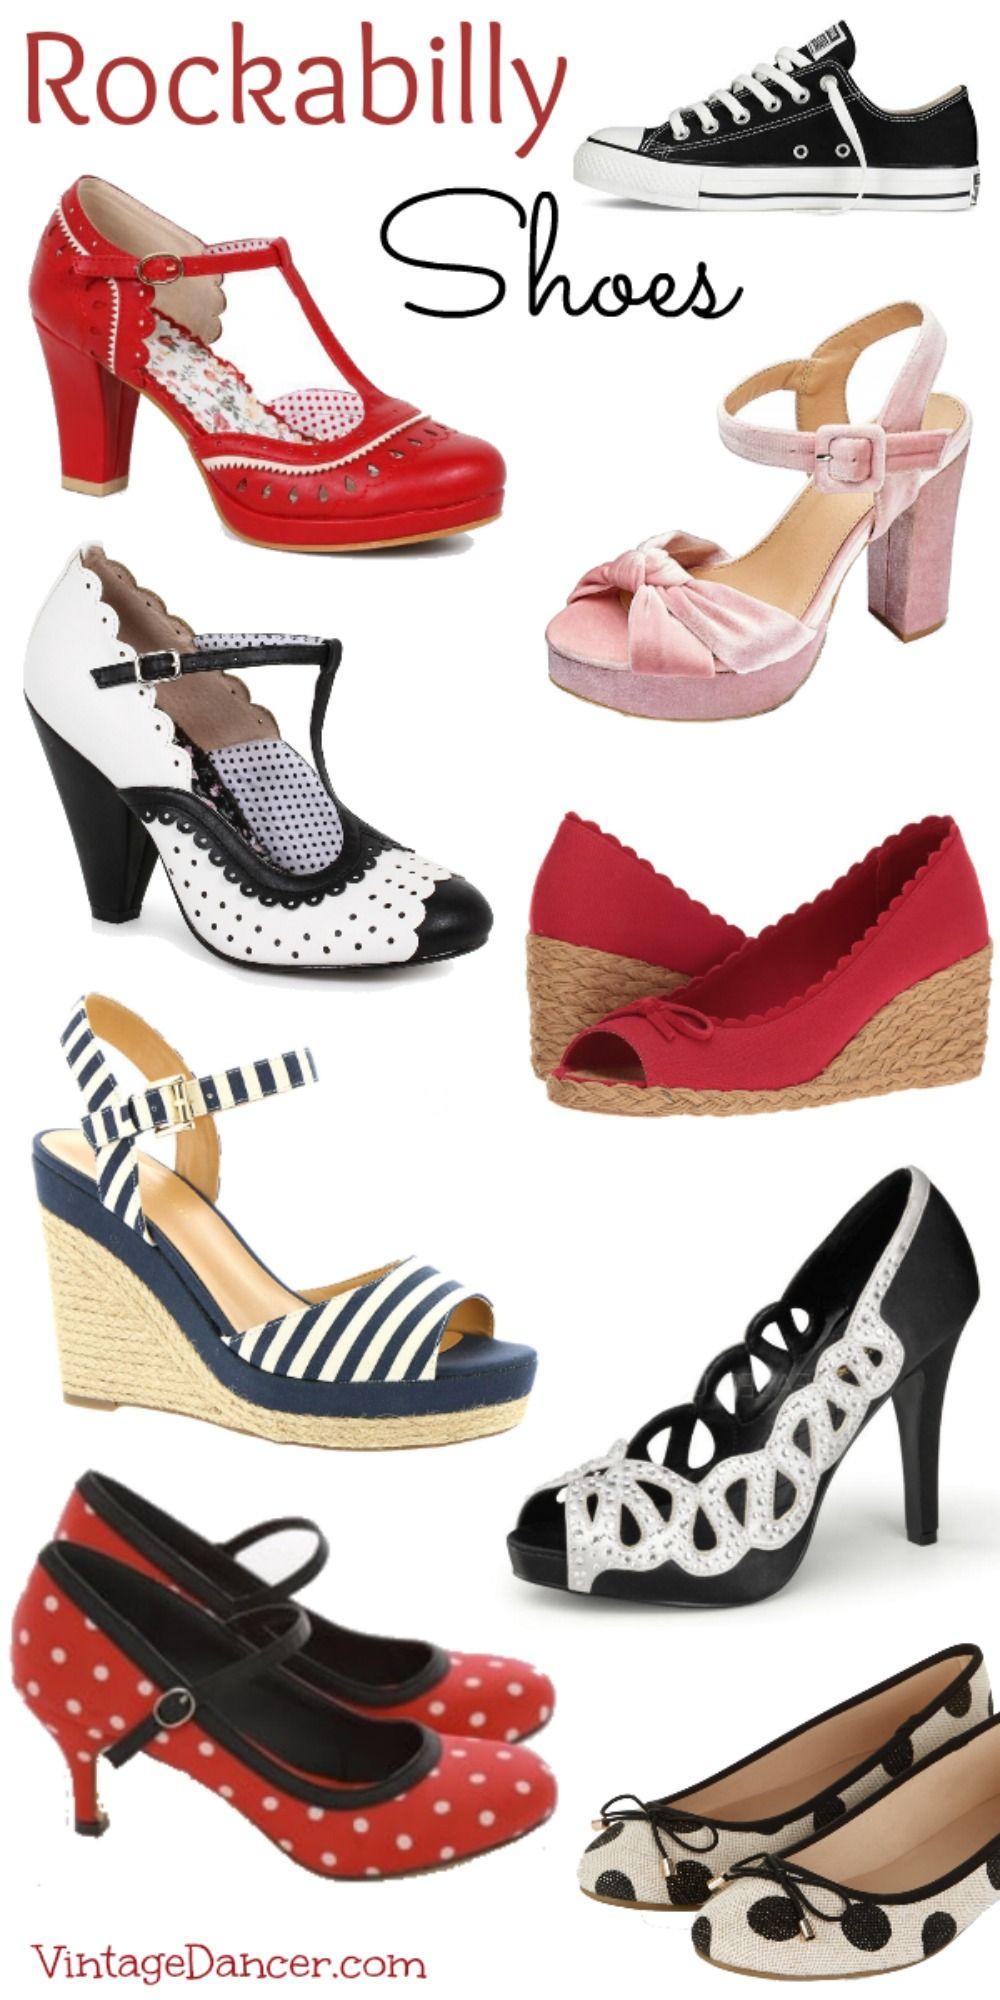 Up Shoes Pin Rockabilly Pin HeelsBootsFlats Shoes Rockabilly E9DHI2W